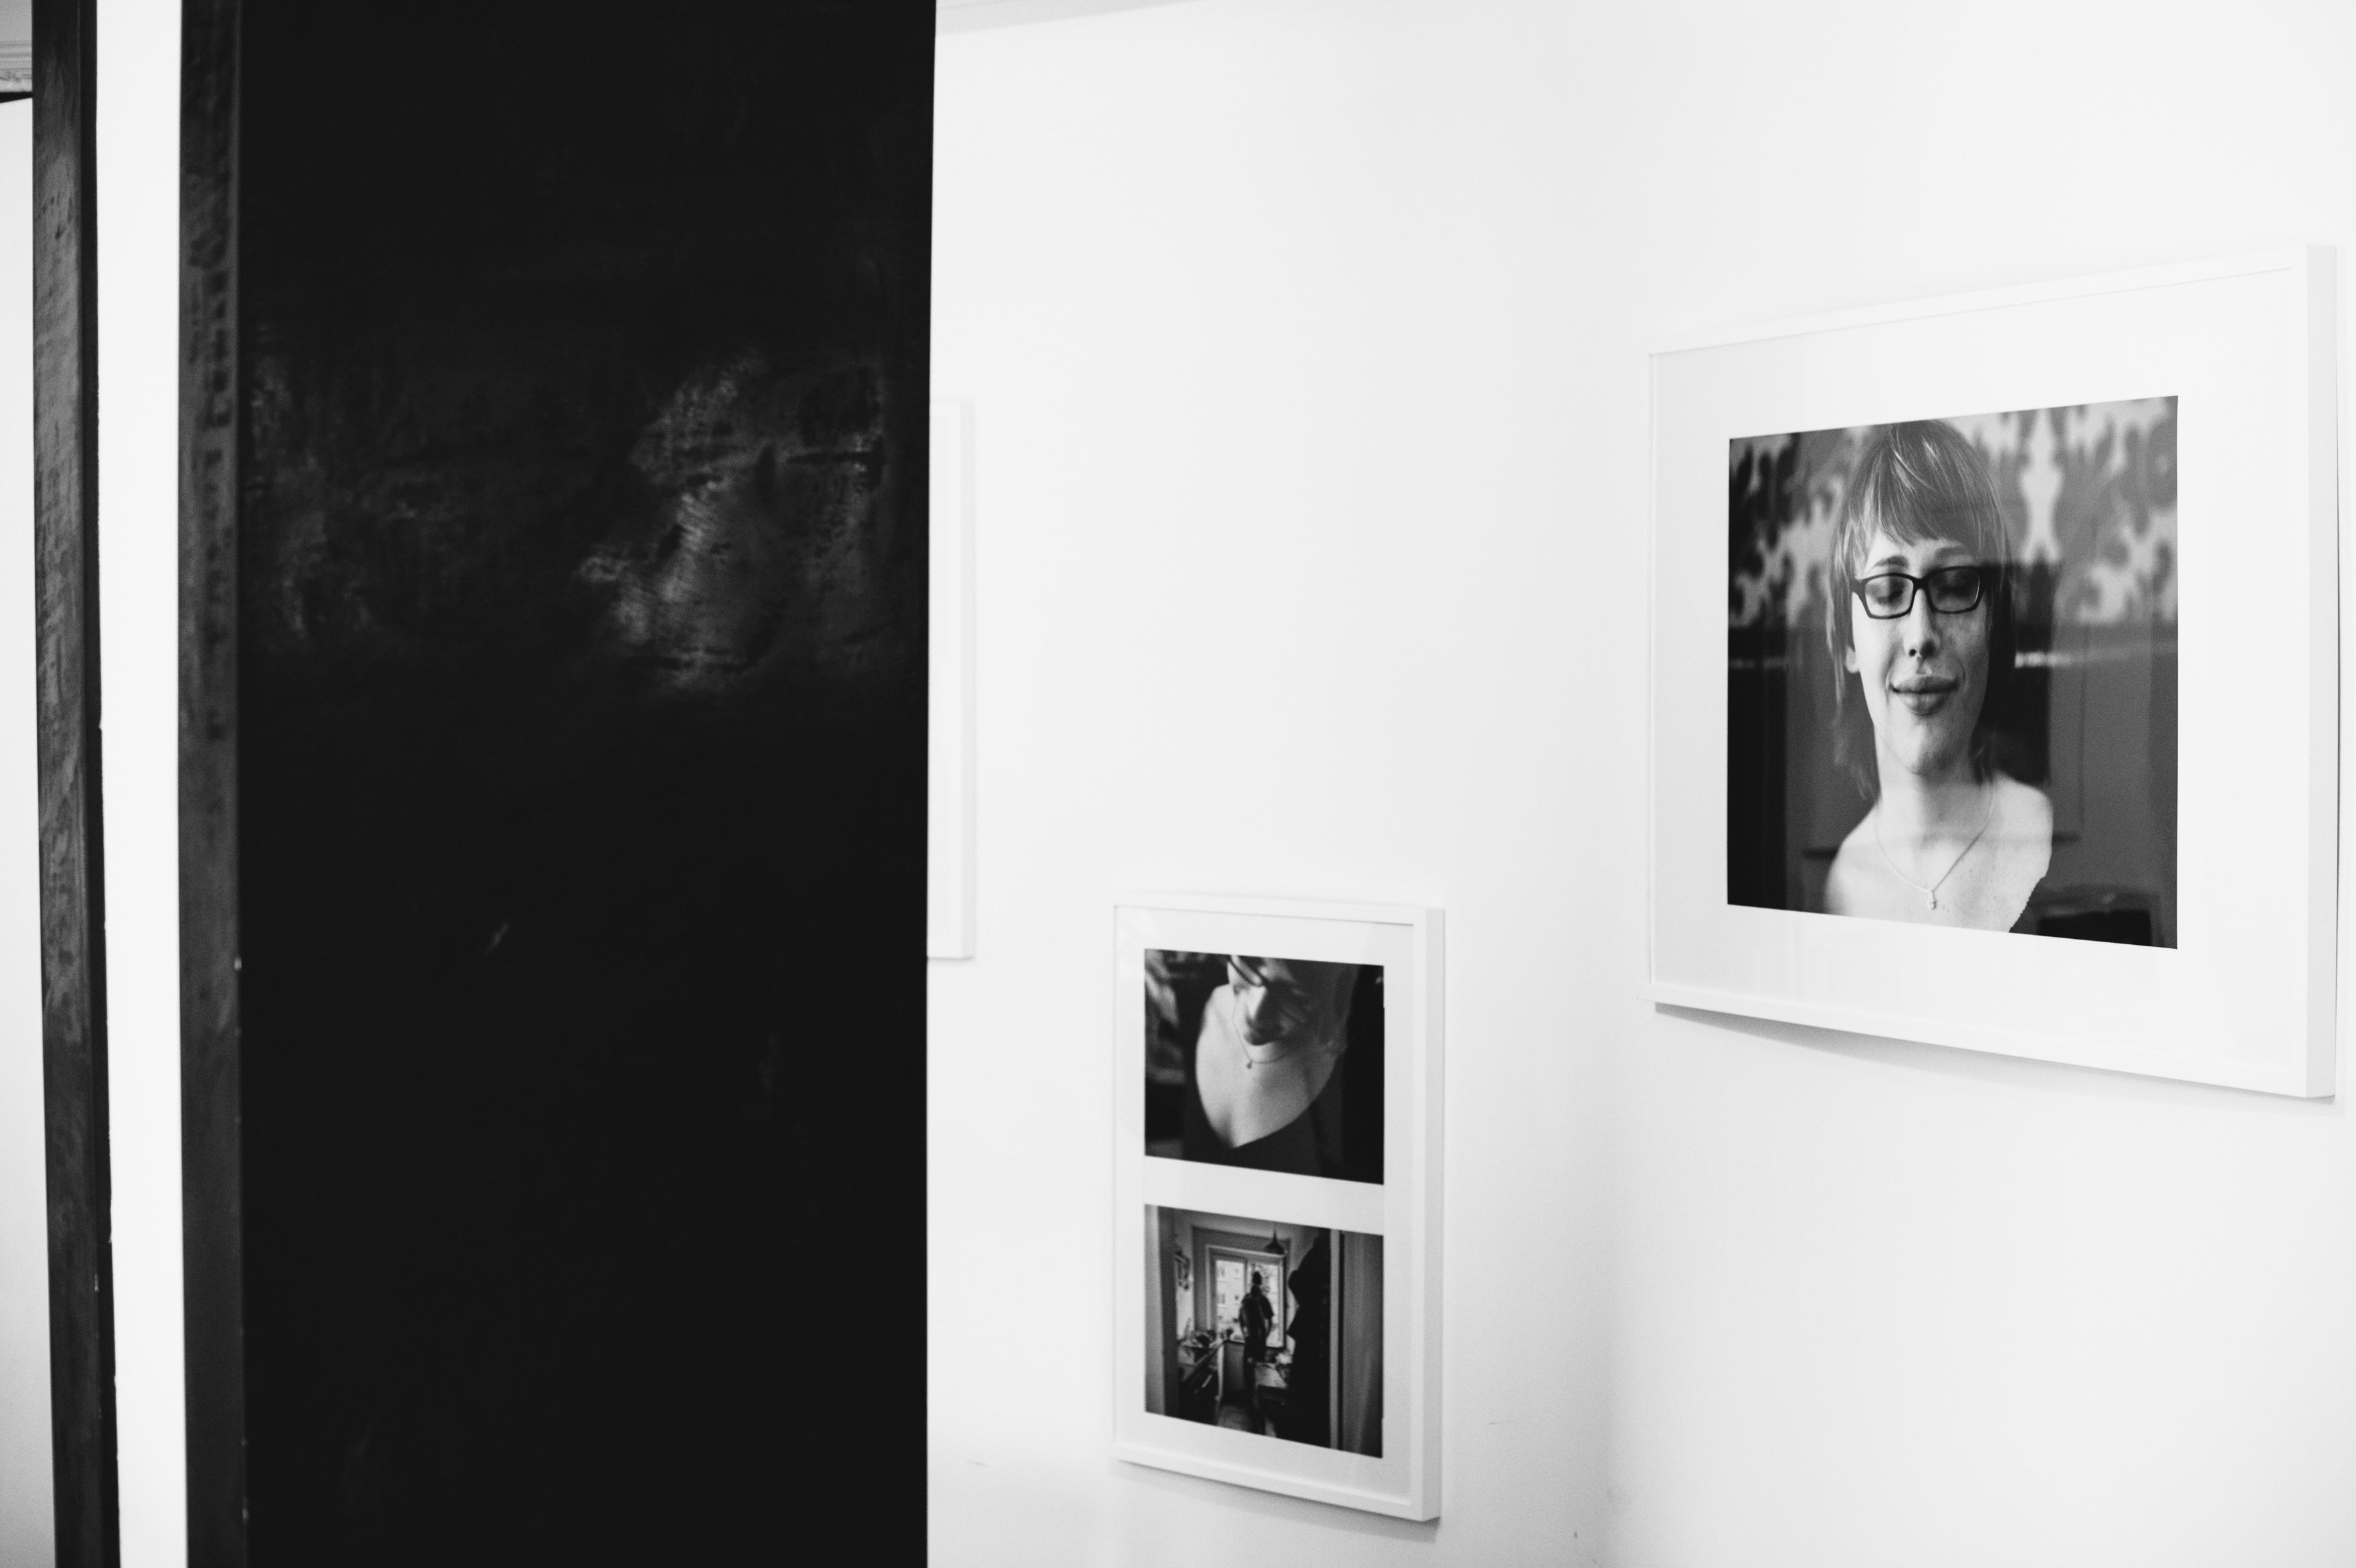 Transgender, Zattoo, Berlin, Ausstellung, Foto, Projekt, Kathrin Stahl Hamburg,05